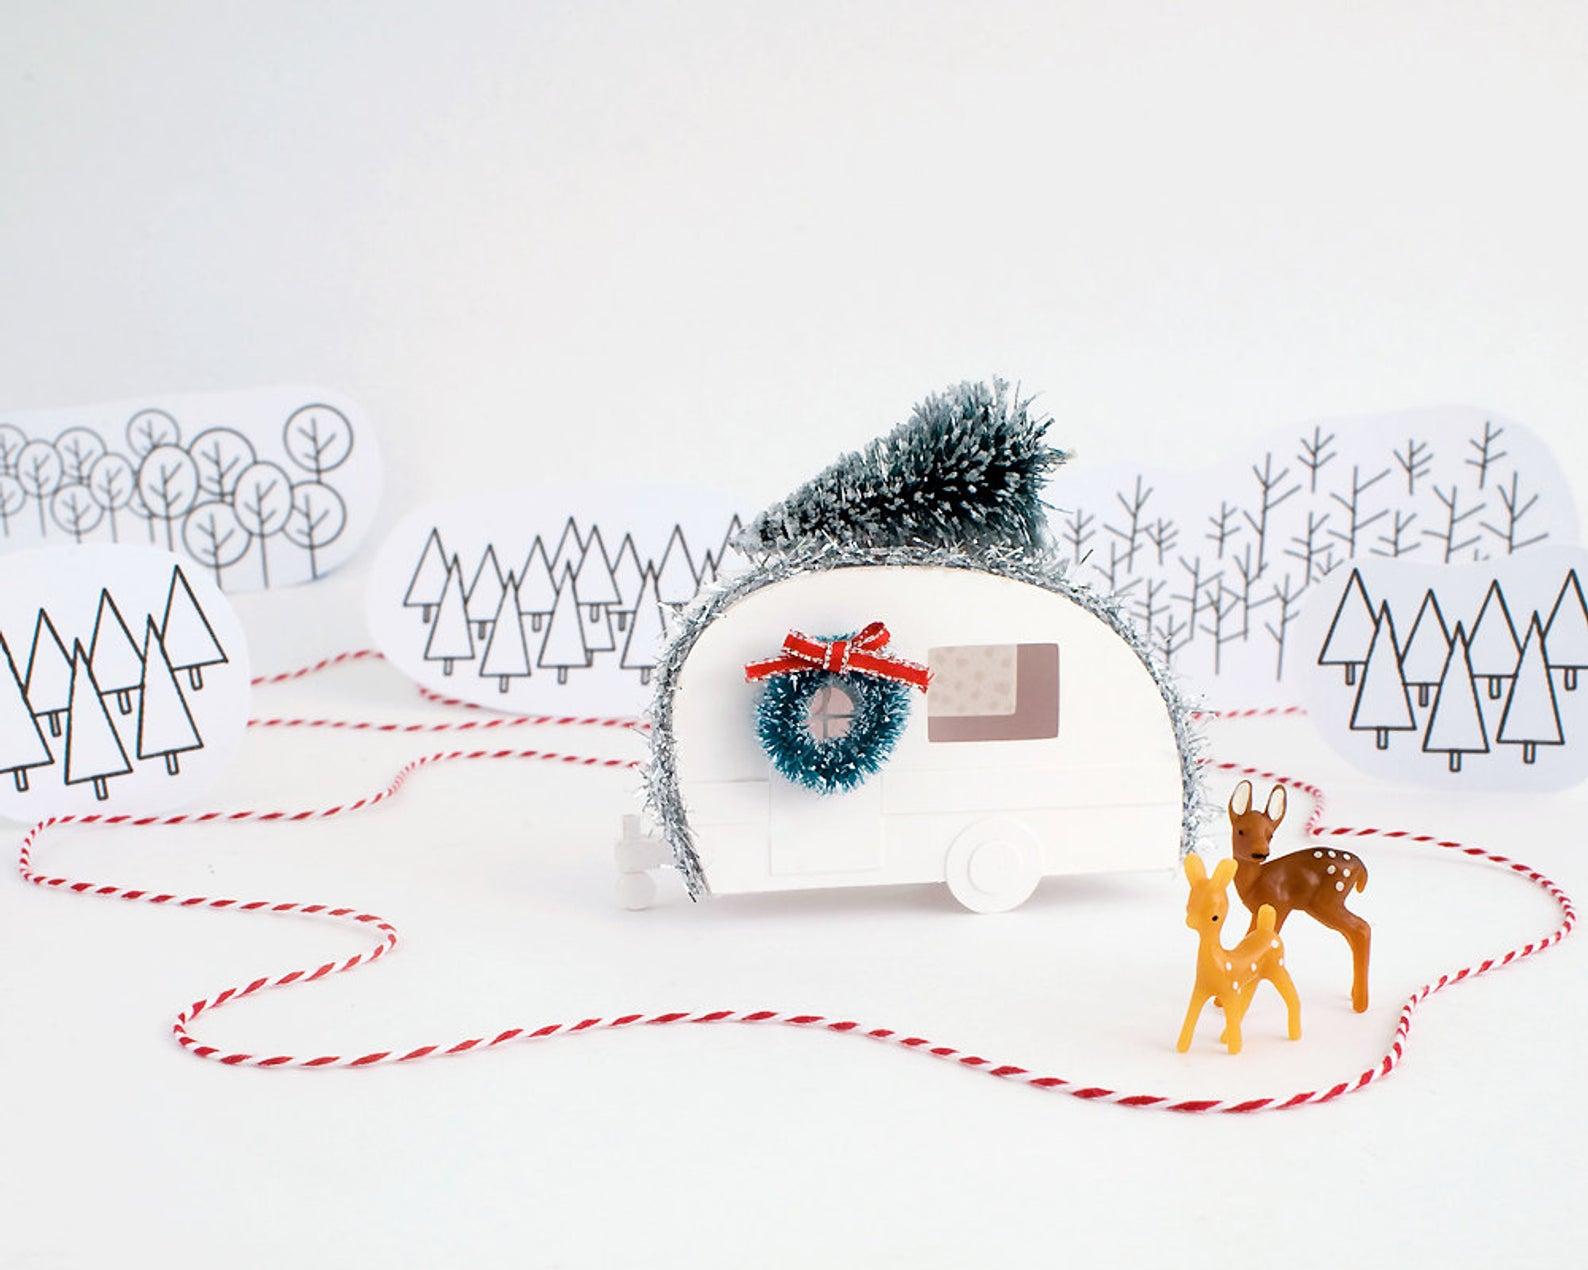 Vintage Camper Christmas Ornament DIY Kit By Holiday Spirits Decor